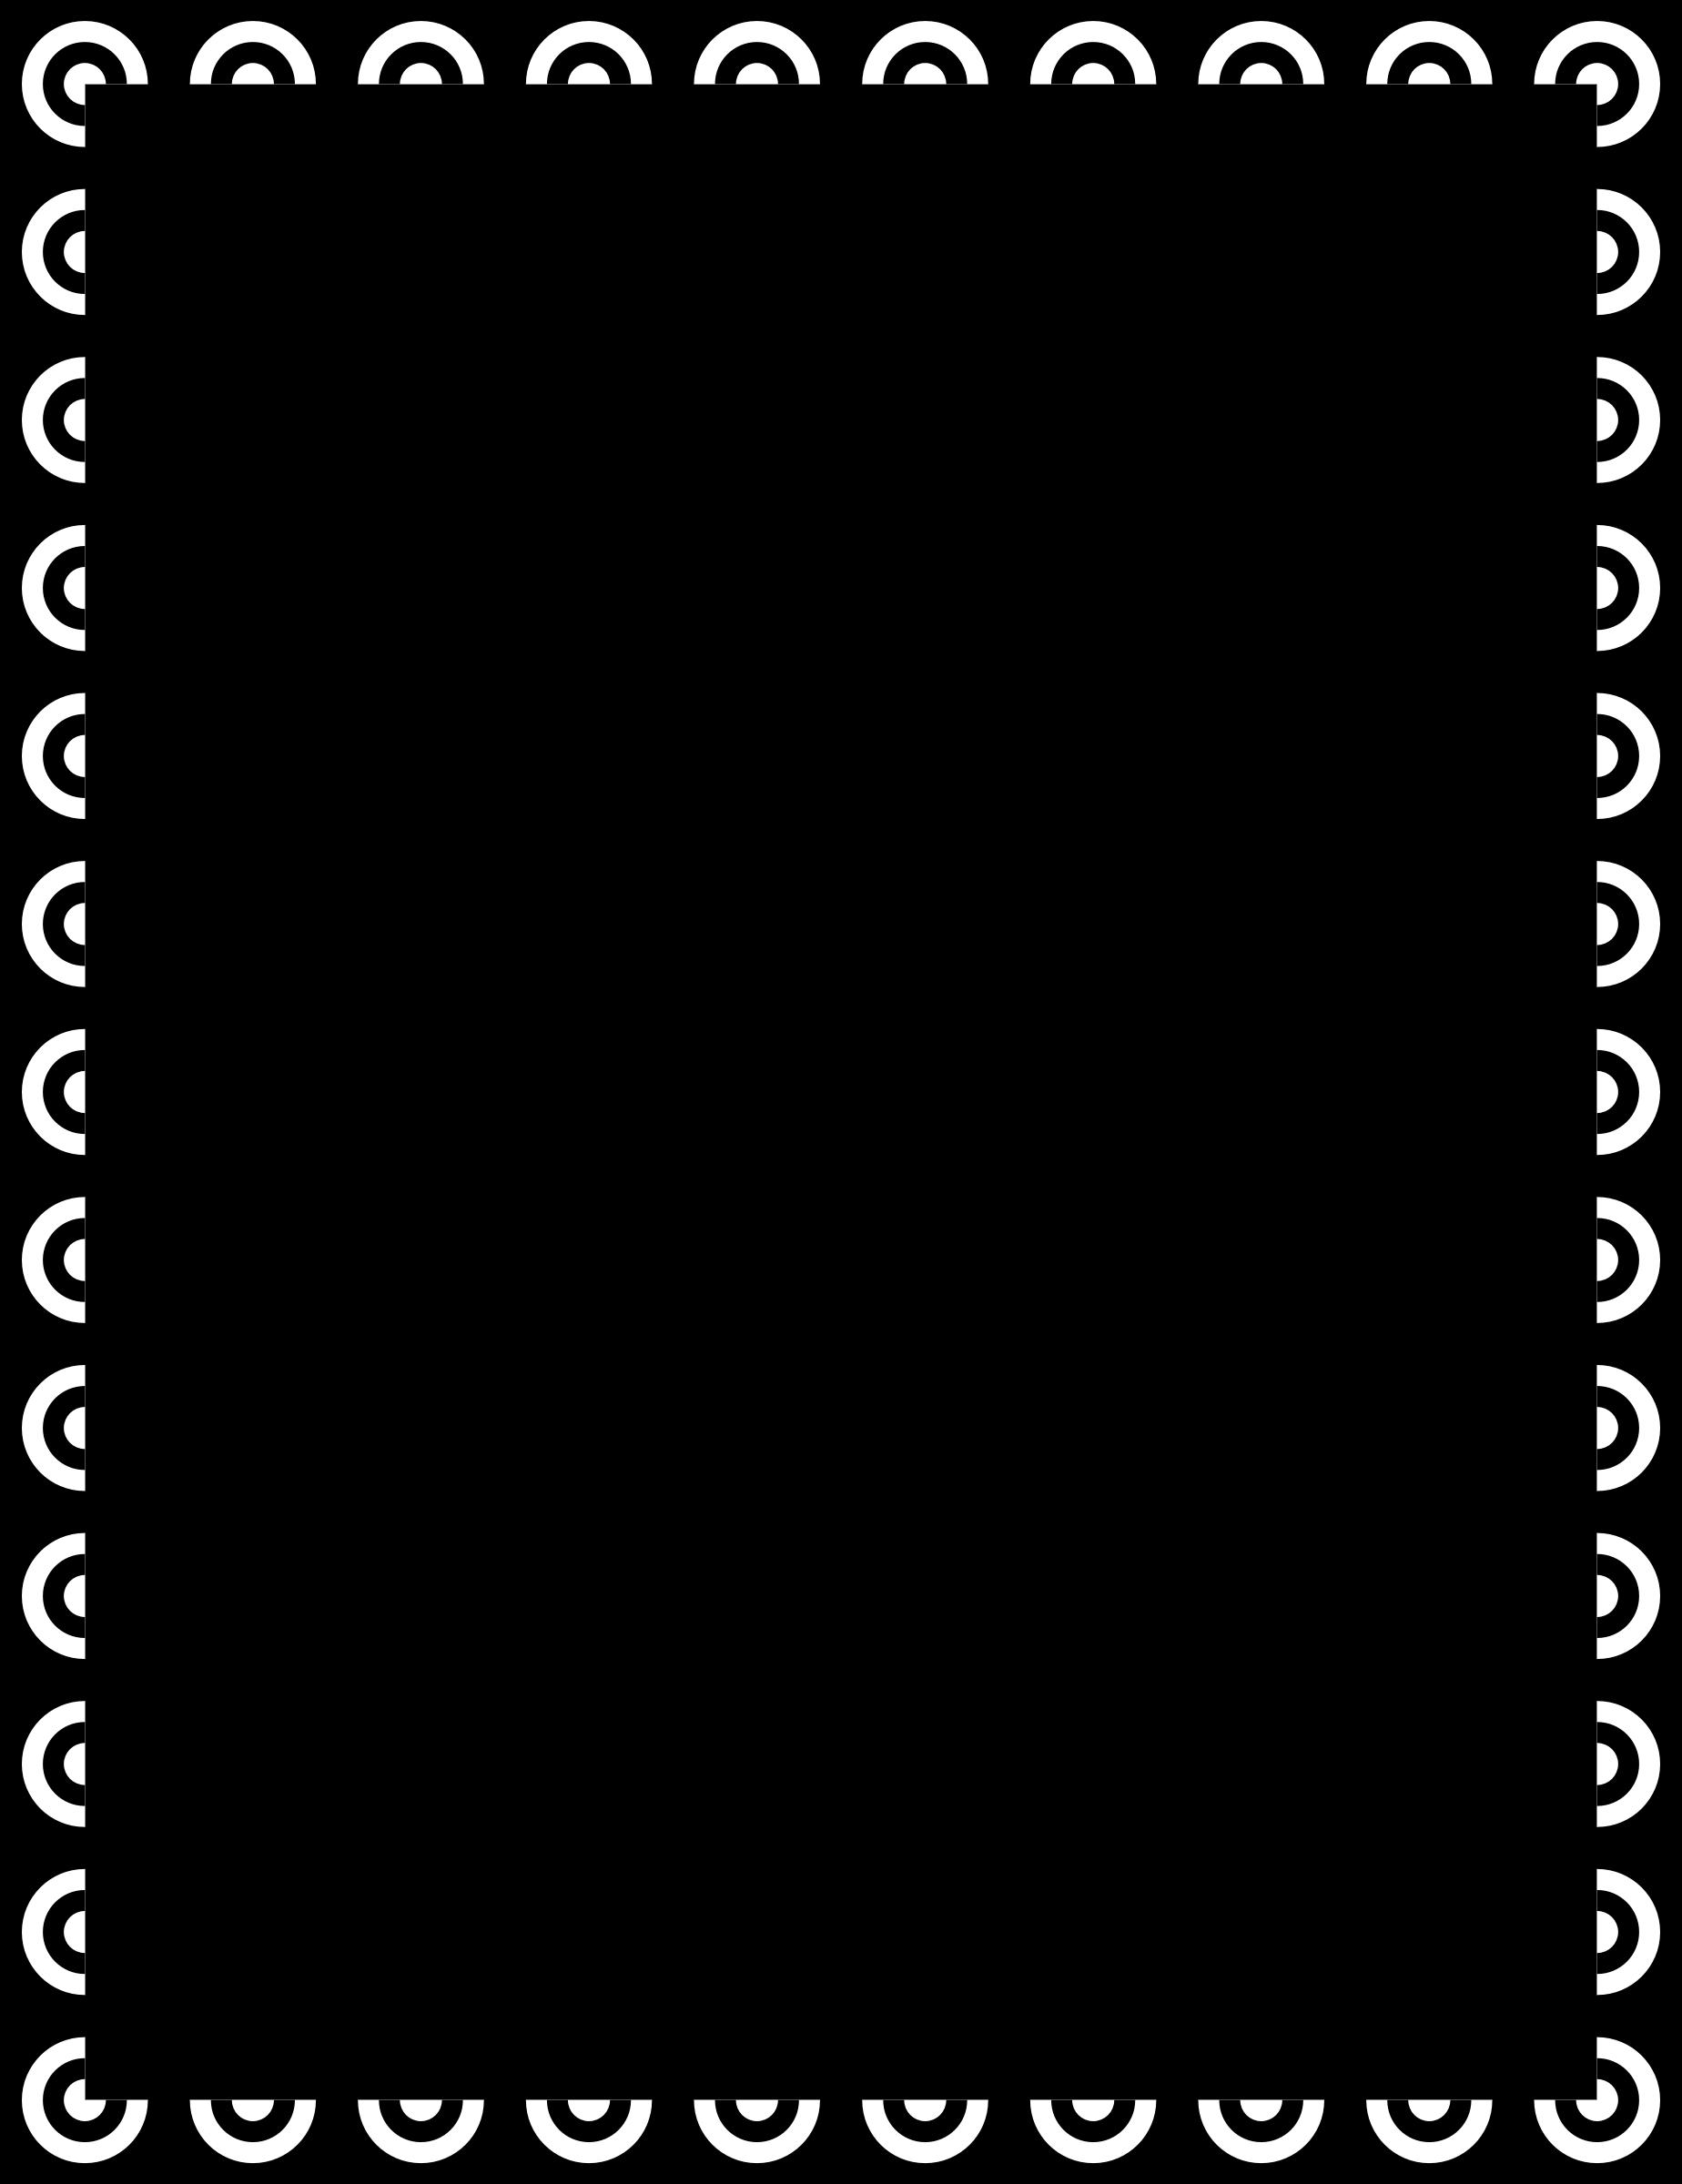 Clipart - Target frame